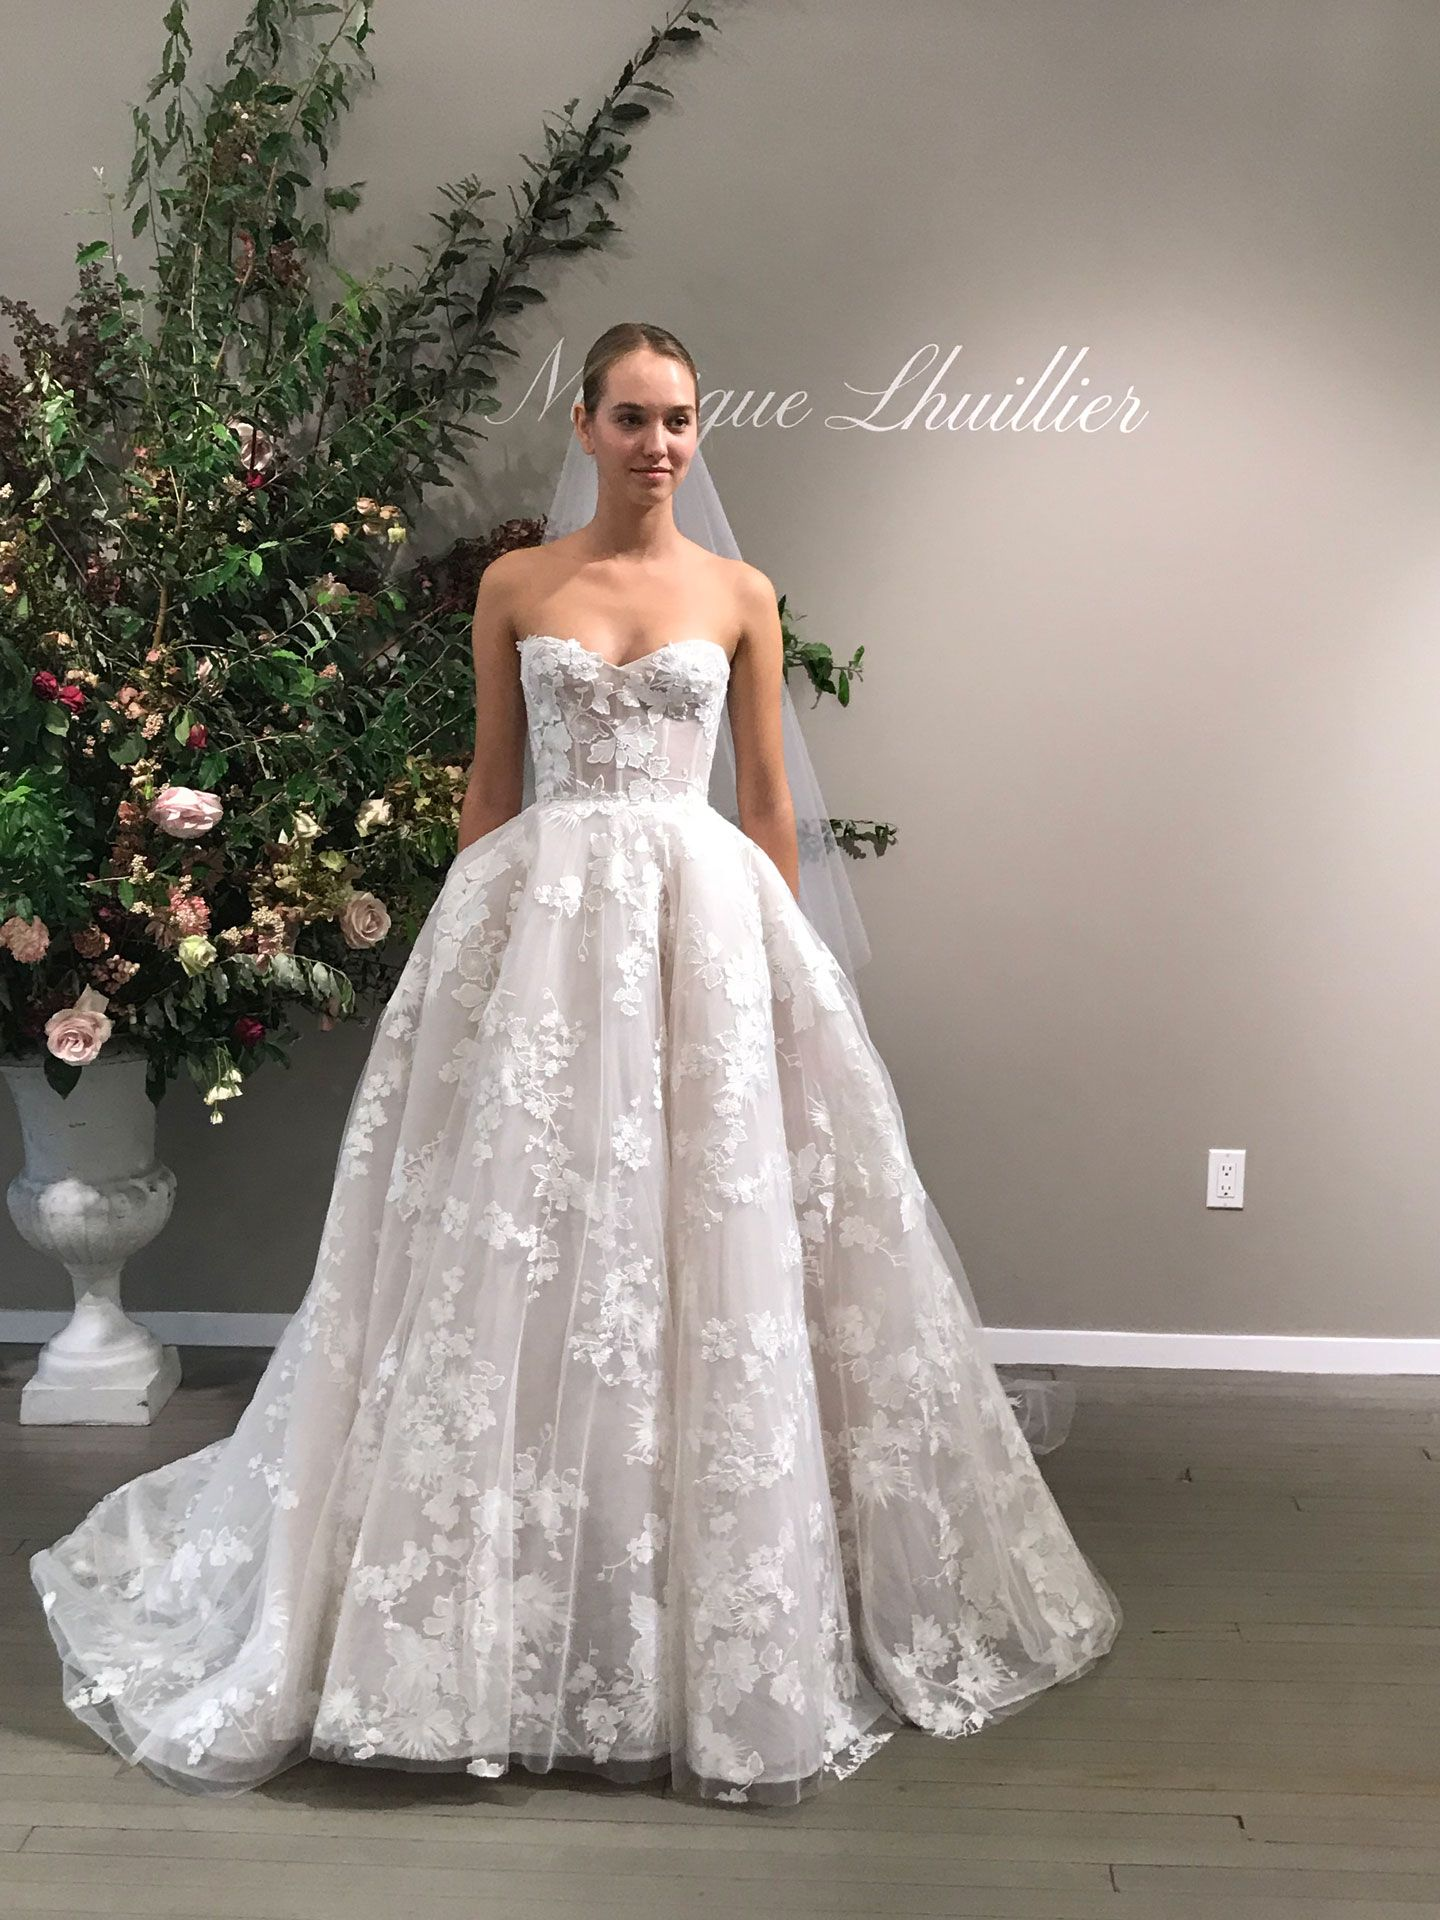 Monique Lhuillier Bridal Fall 2019 Heidi Elnora Wedding Dress